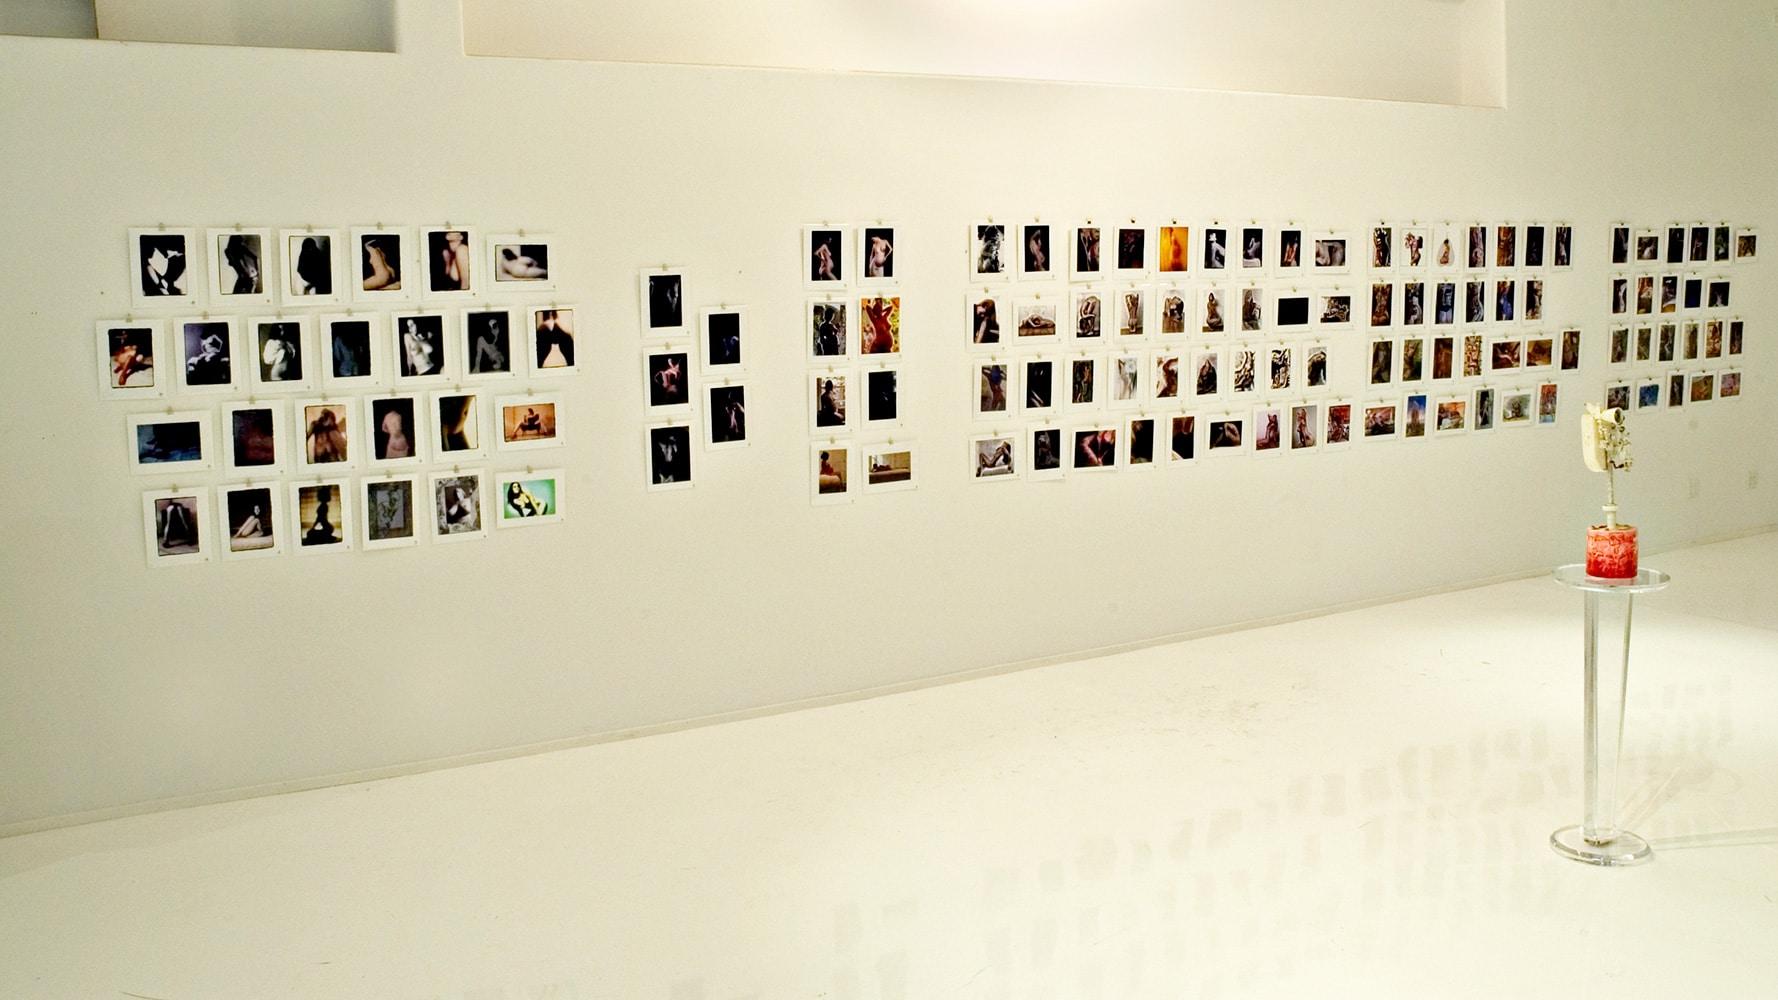 Body_language_exhibit_interior_gregory_beylerian_8